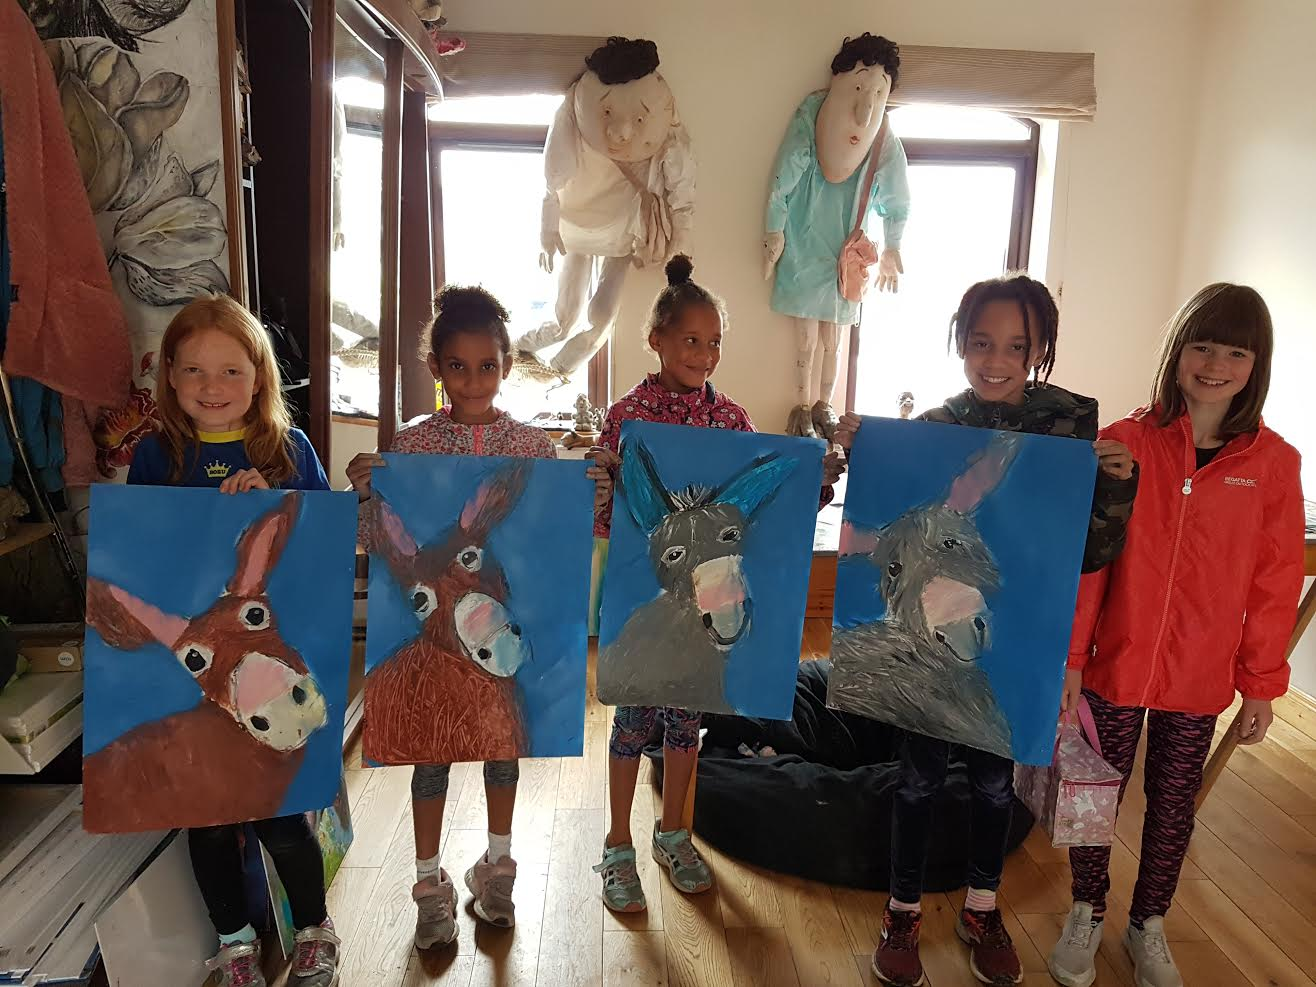 summer 2020 painting 007 - Ennis Art School